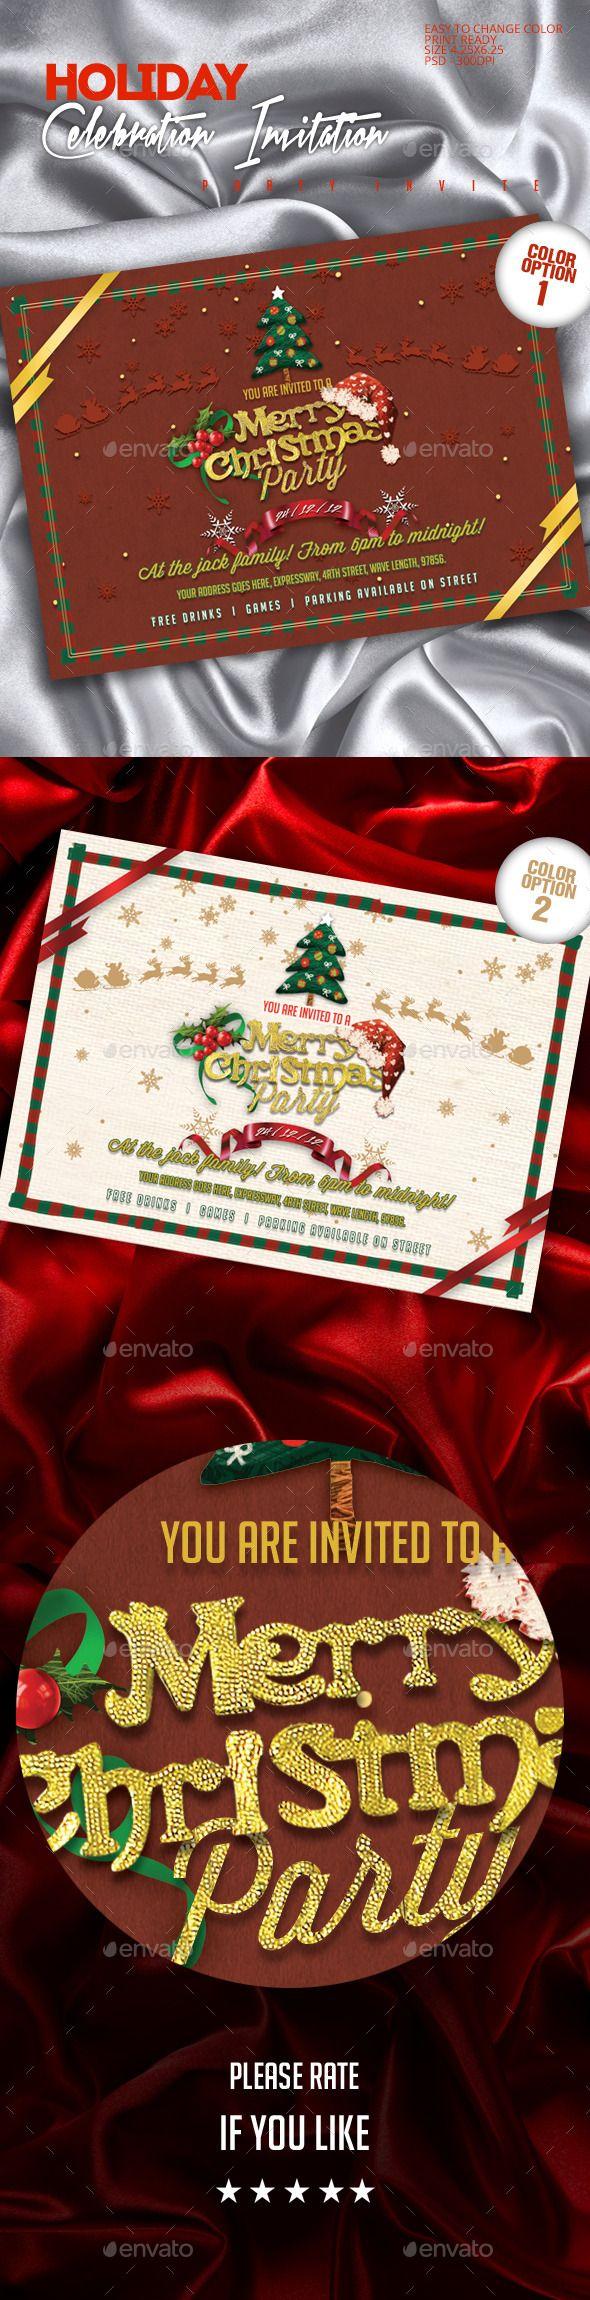 company christmas party invitation templates%0A Christmas Party Invite Template